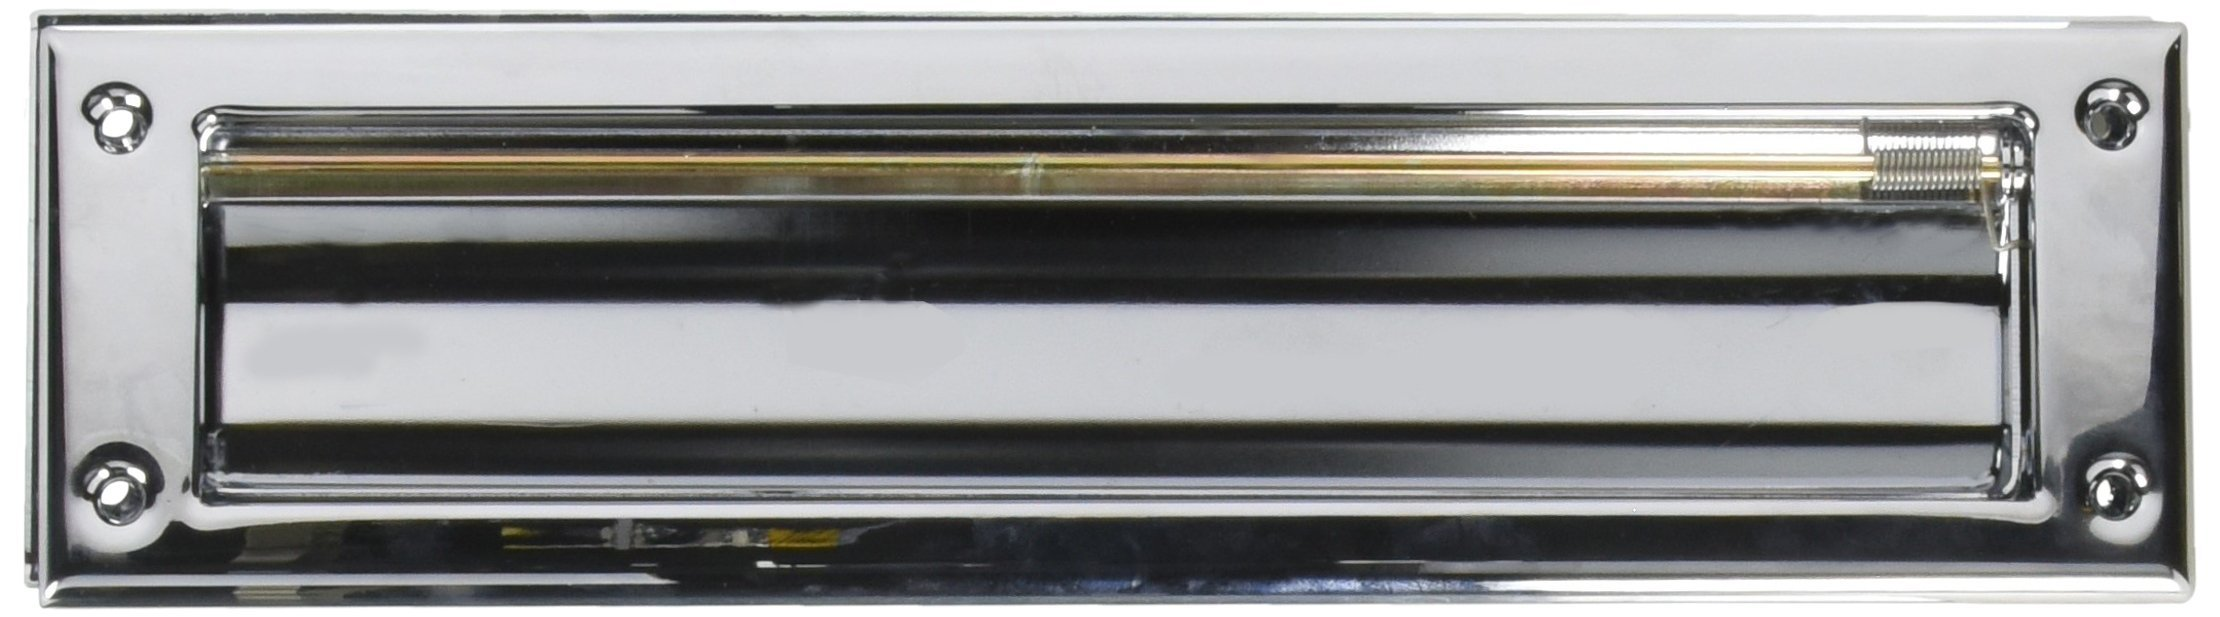 Baldwin 0012260 Letter Box Plate, Bright Chrome by Baldwin (Image #1)